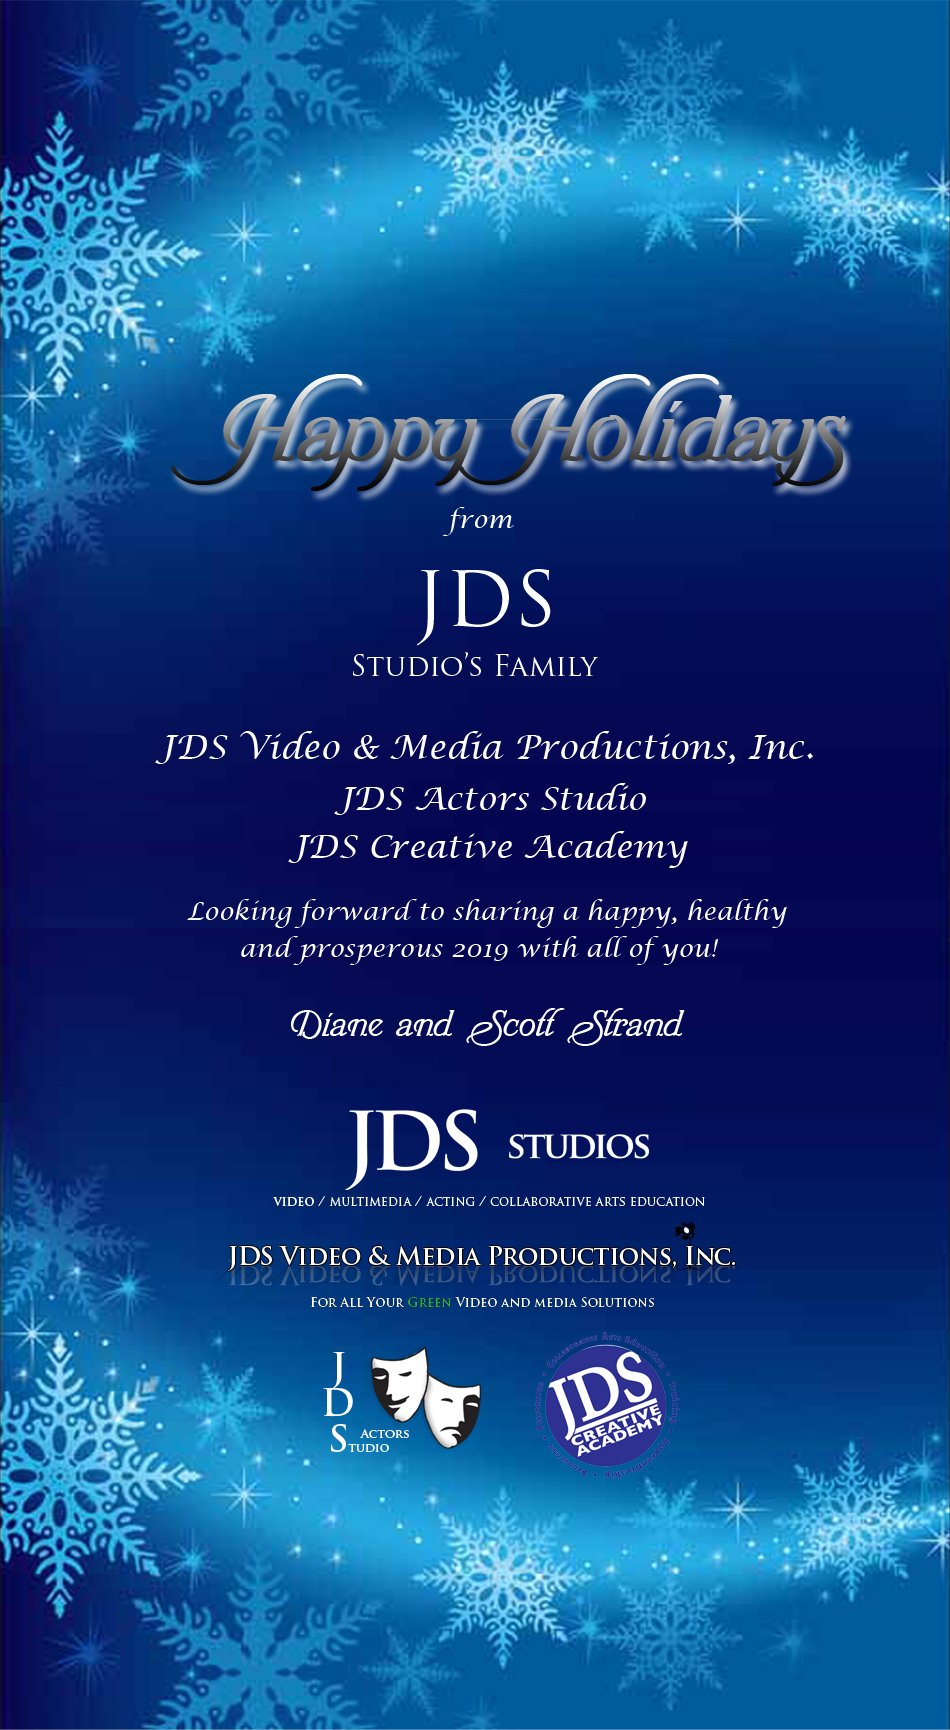 JDS Studios Happy Holidays-2018.jpg